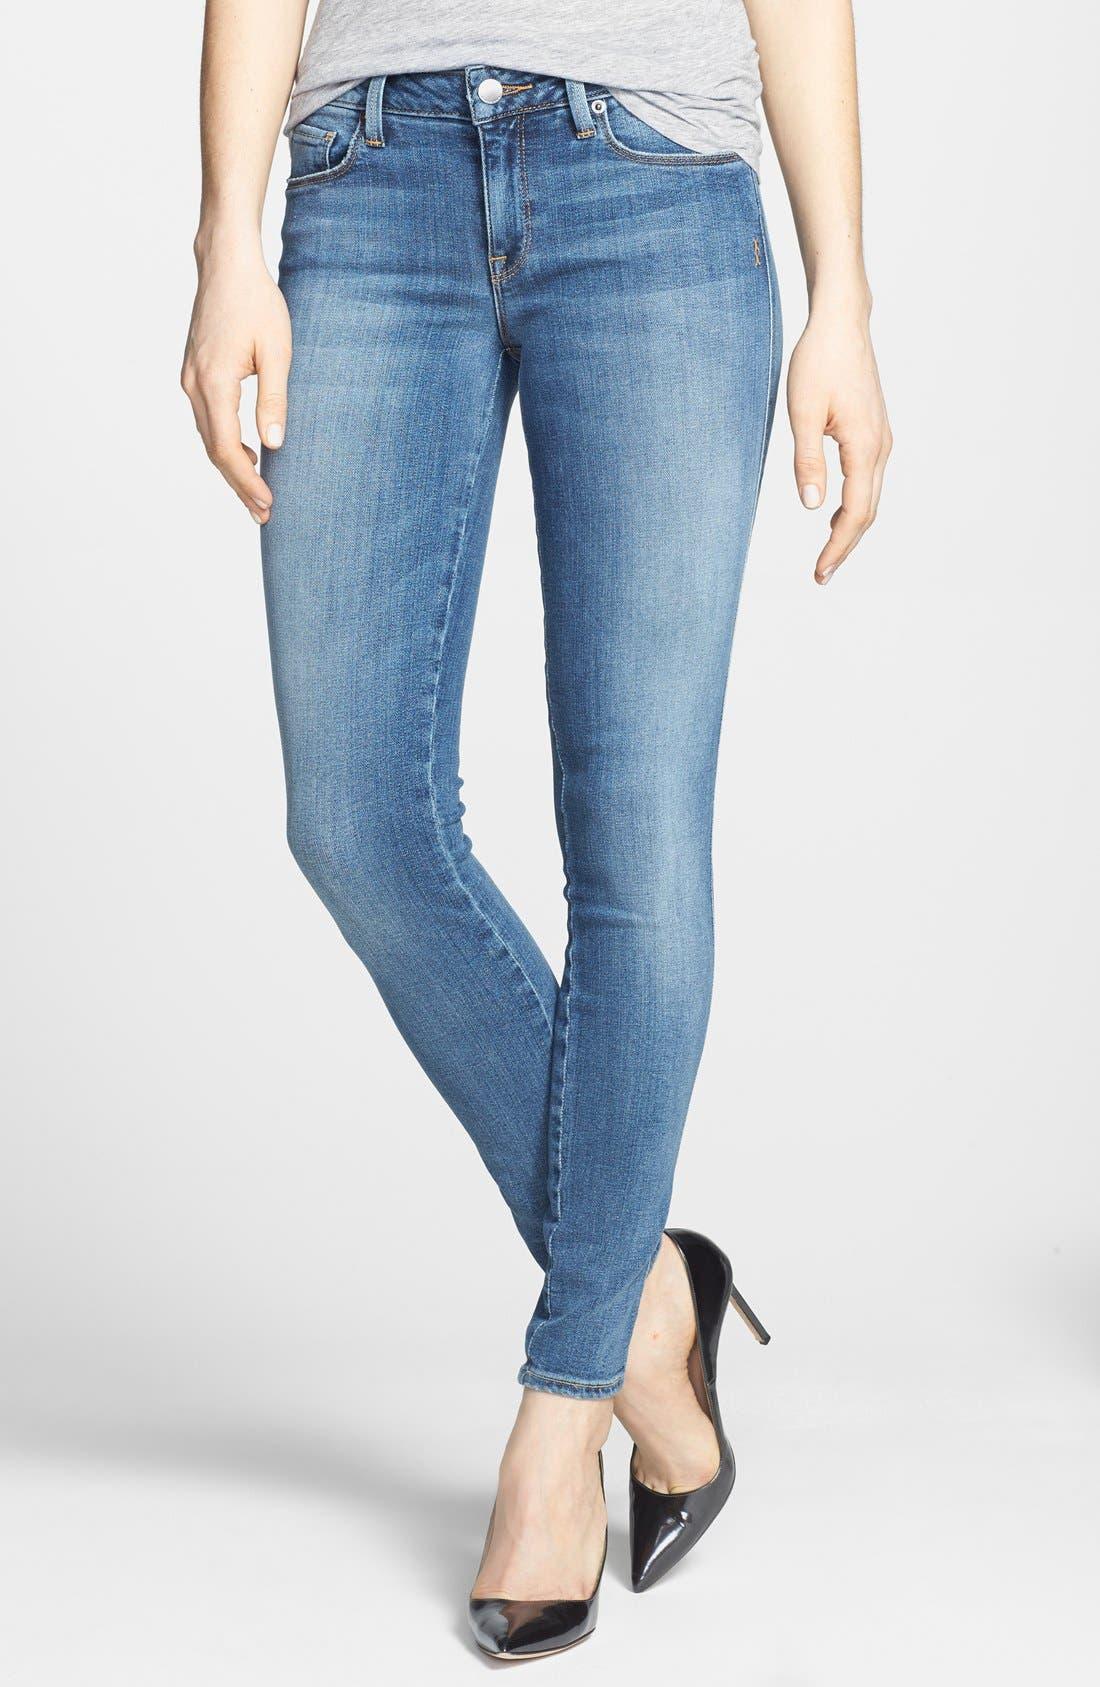 Main Image - Genetic 'Shya' Mid Rise Skinny Jeans (Polish)